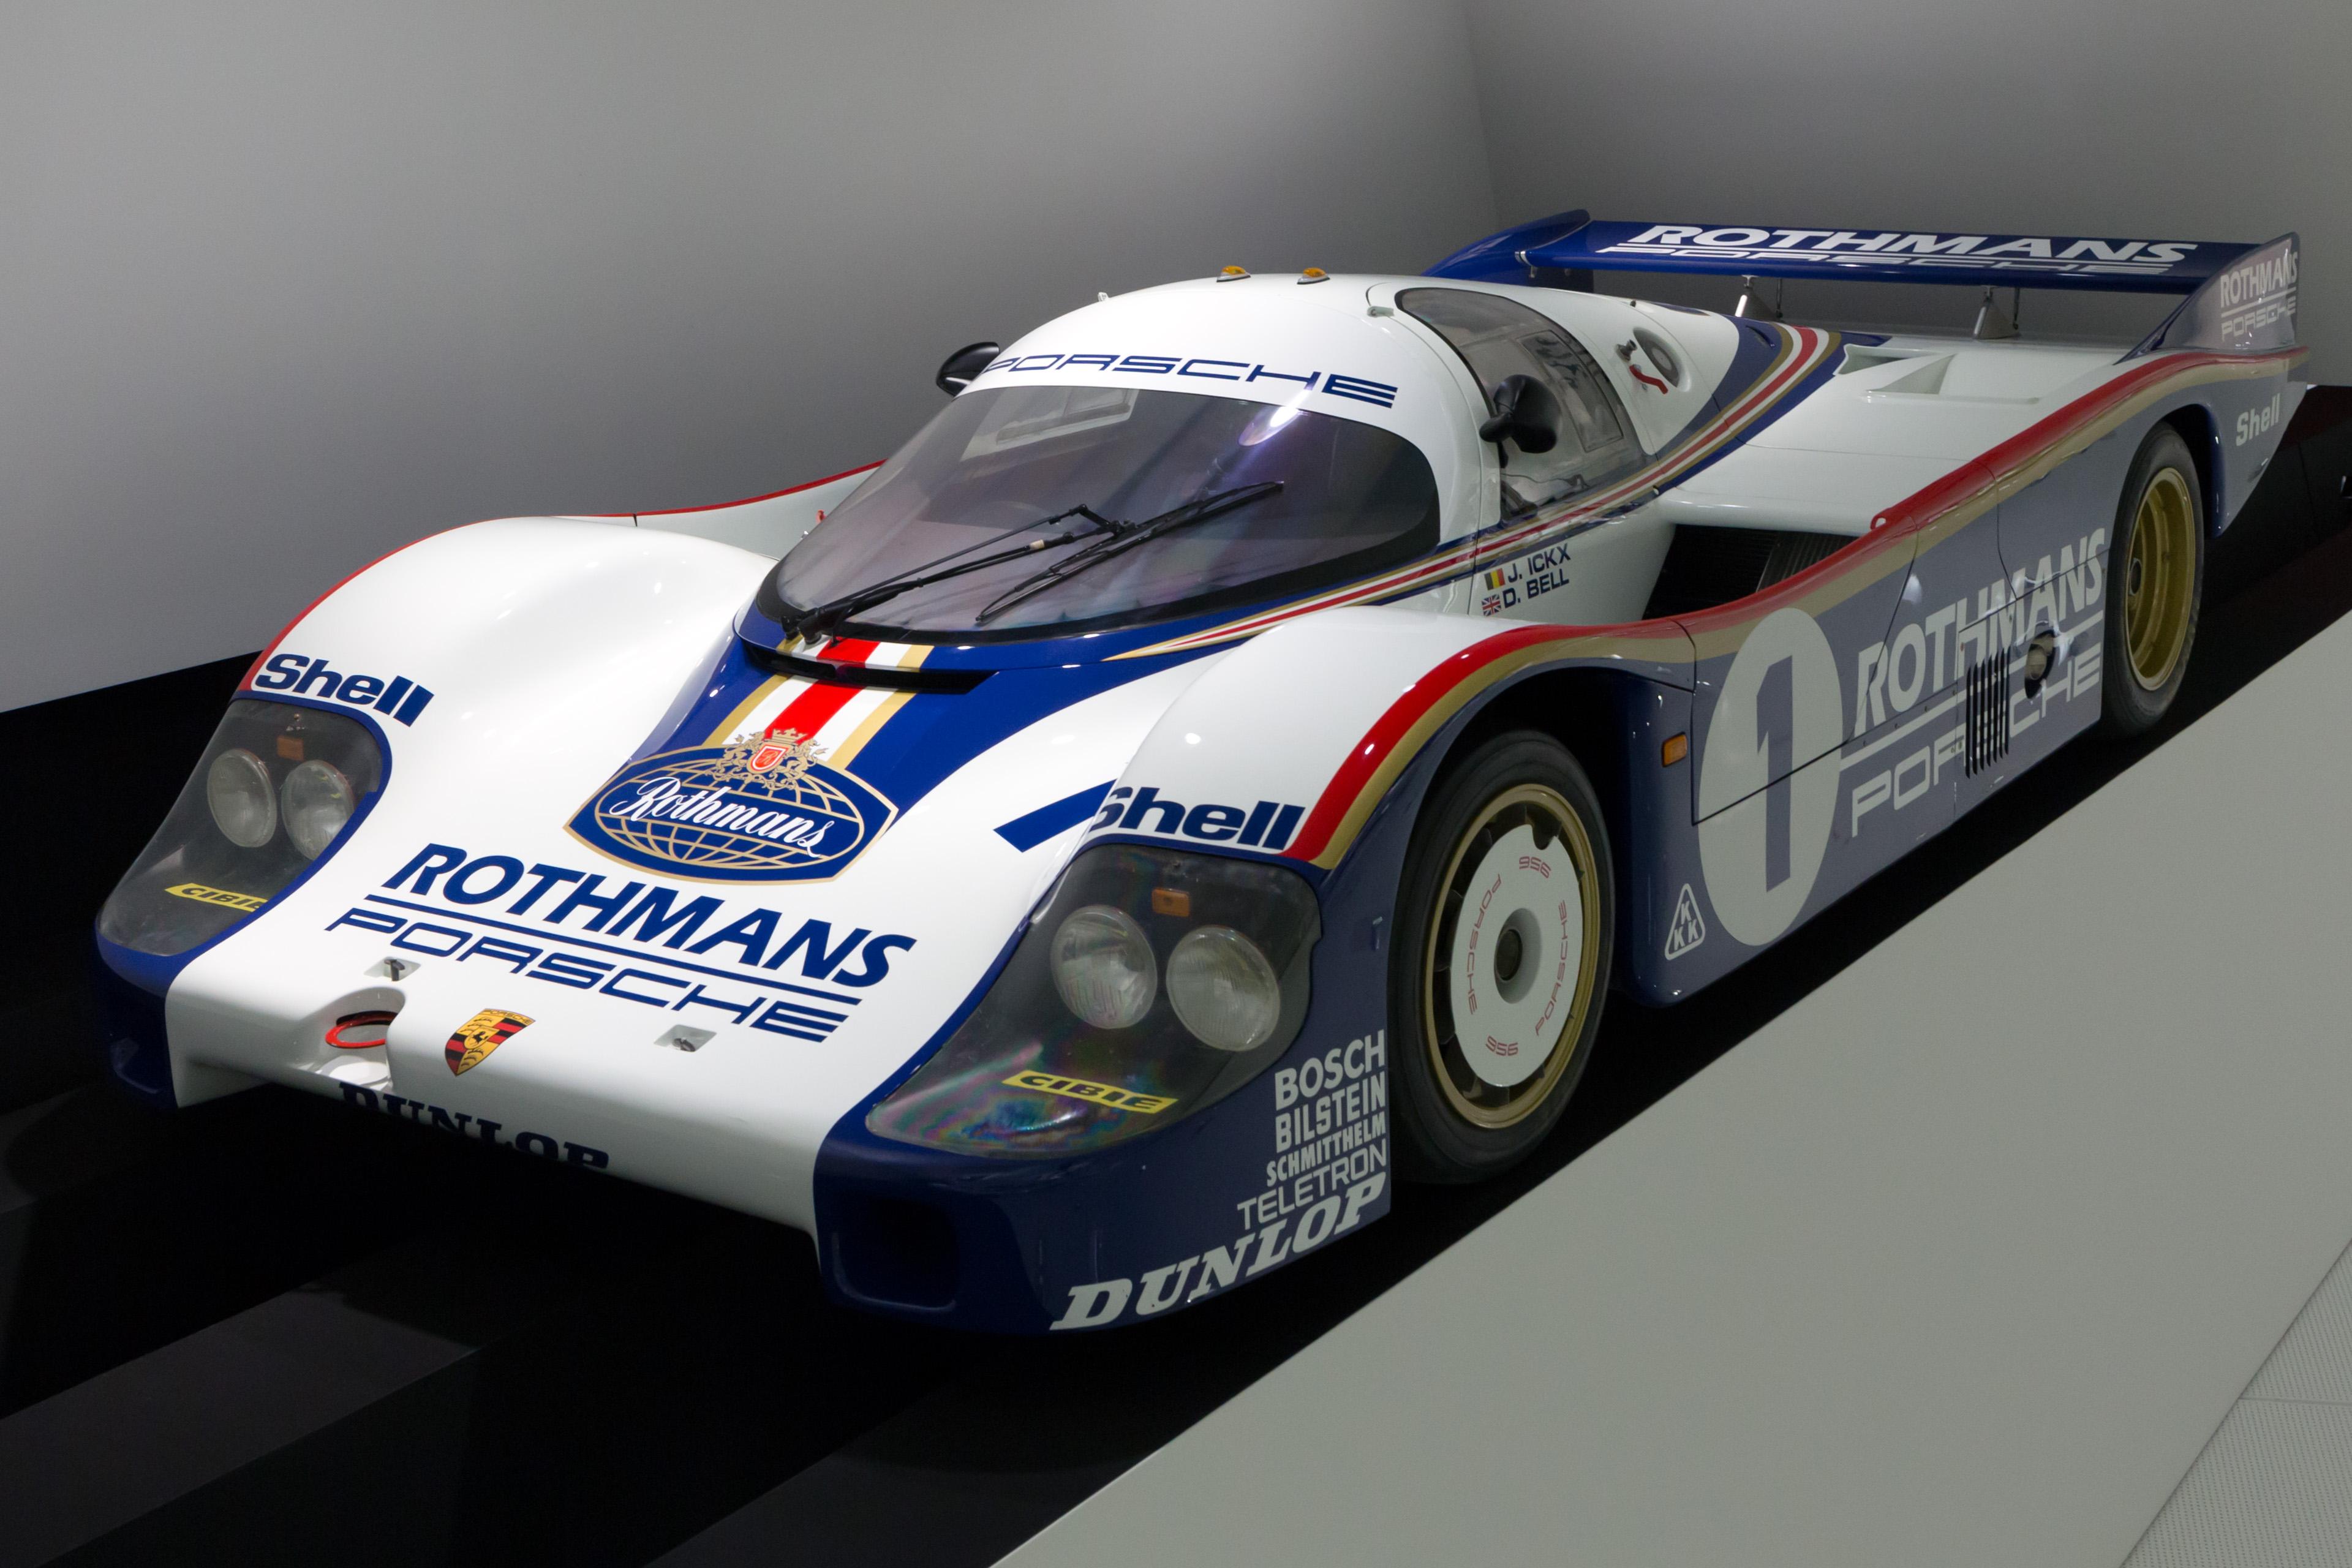 File:Porsche 956 front-left Porsche Museum.jpg